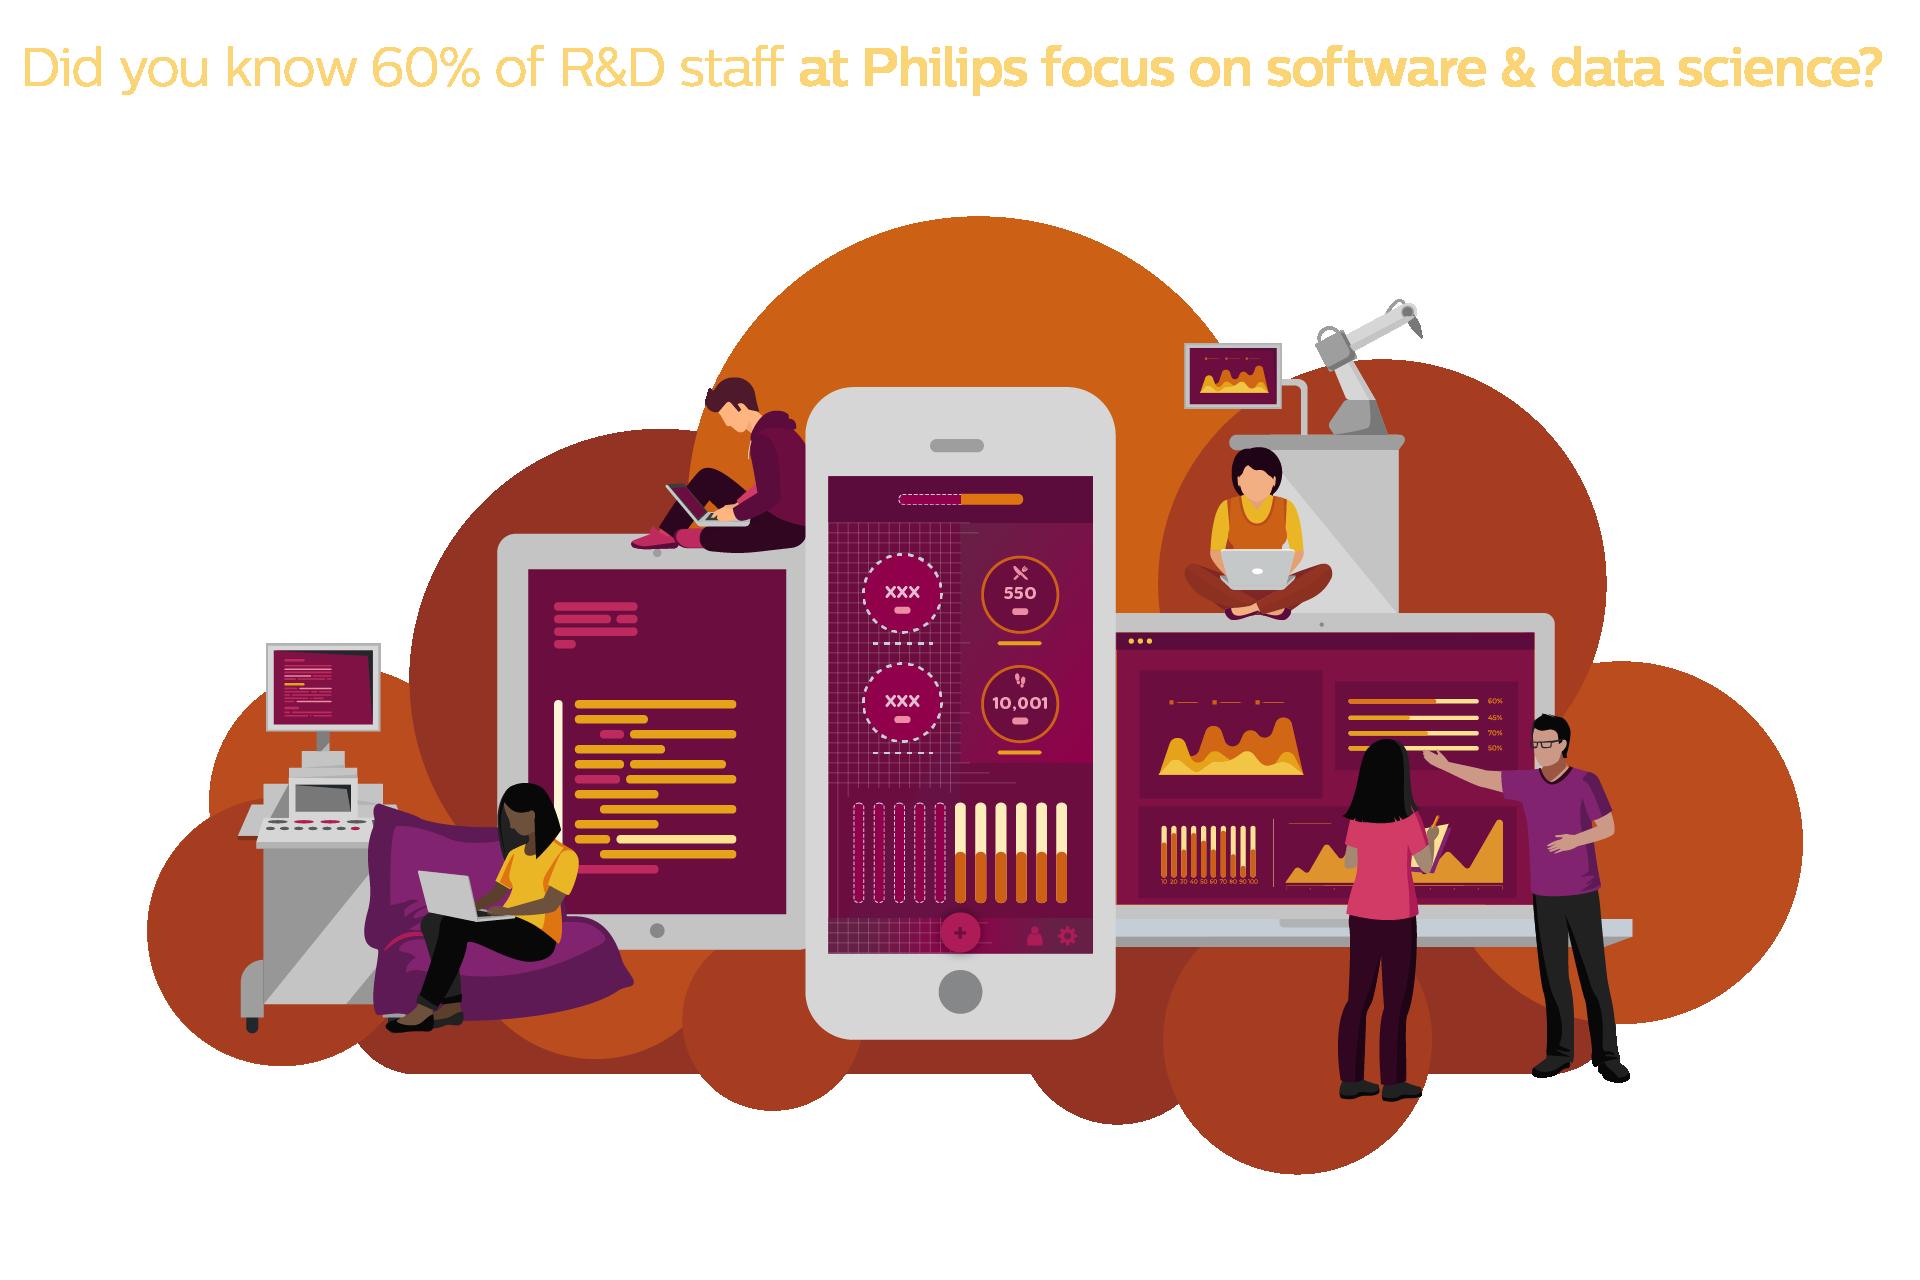 Software developer Illustration infographic